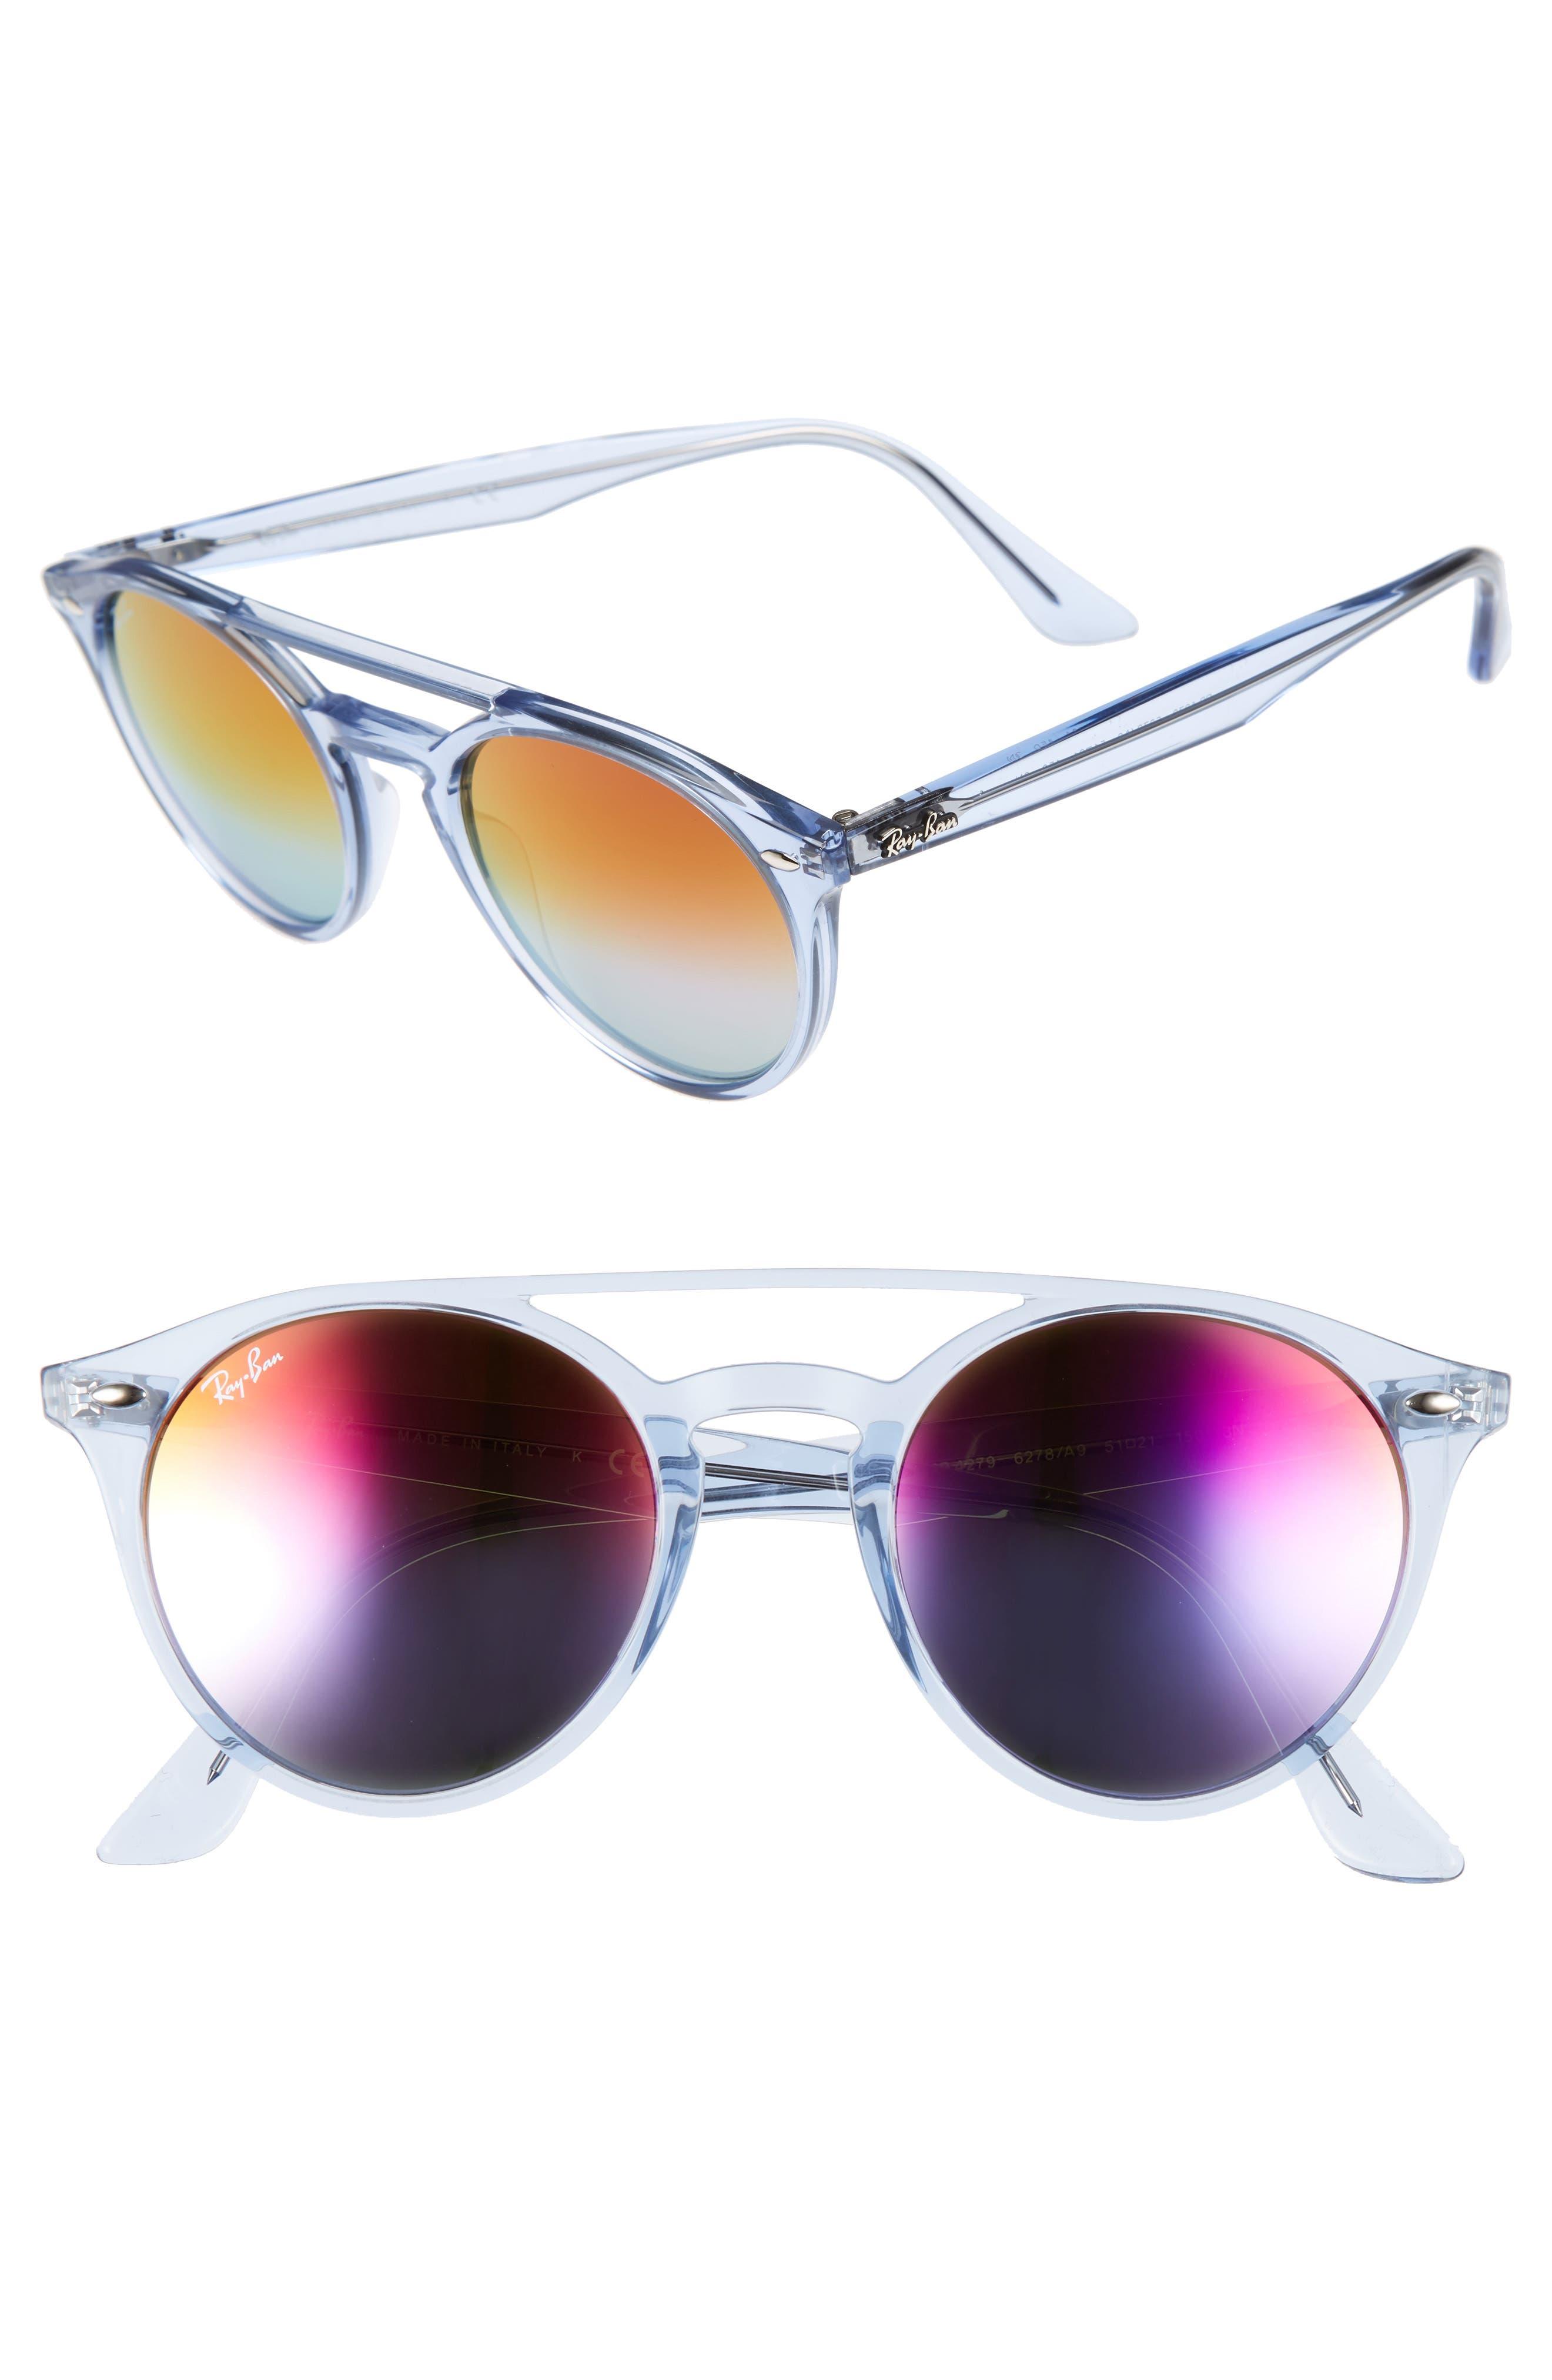 51mm Mirrored Rainbow Sunglasses,                             Main thumbnail 1, color,                             428